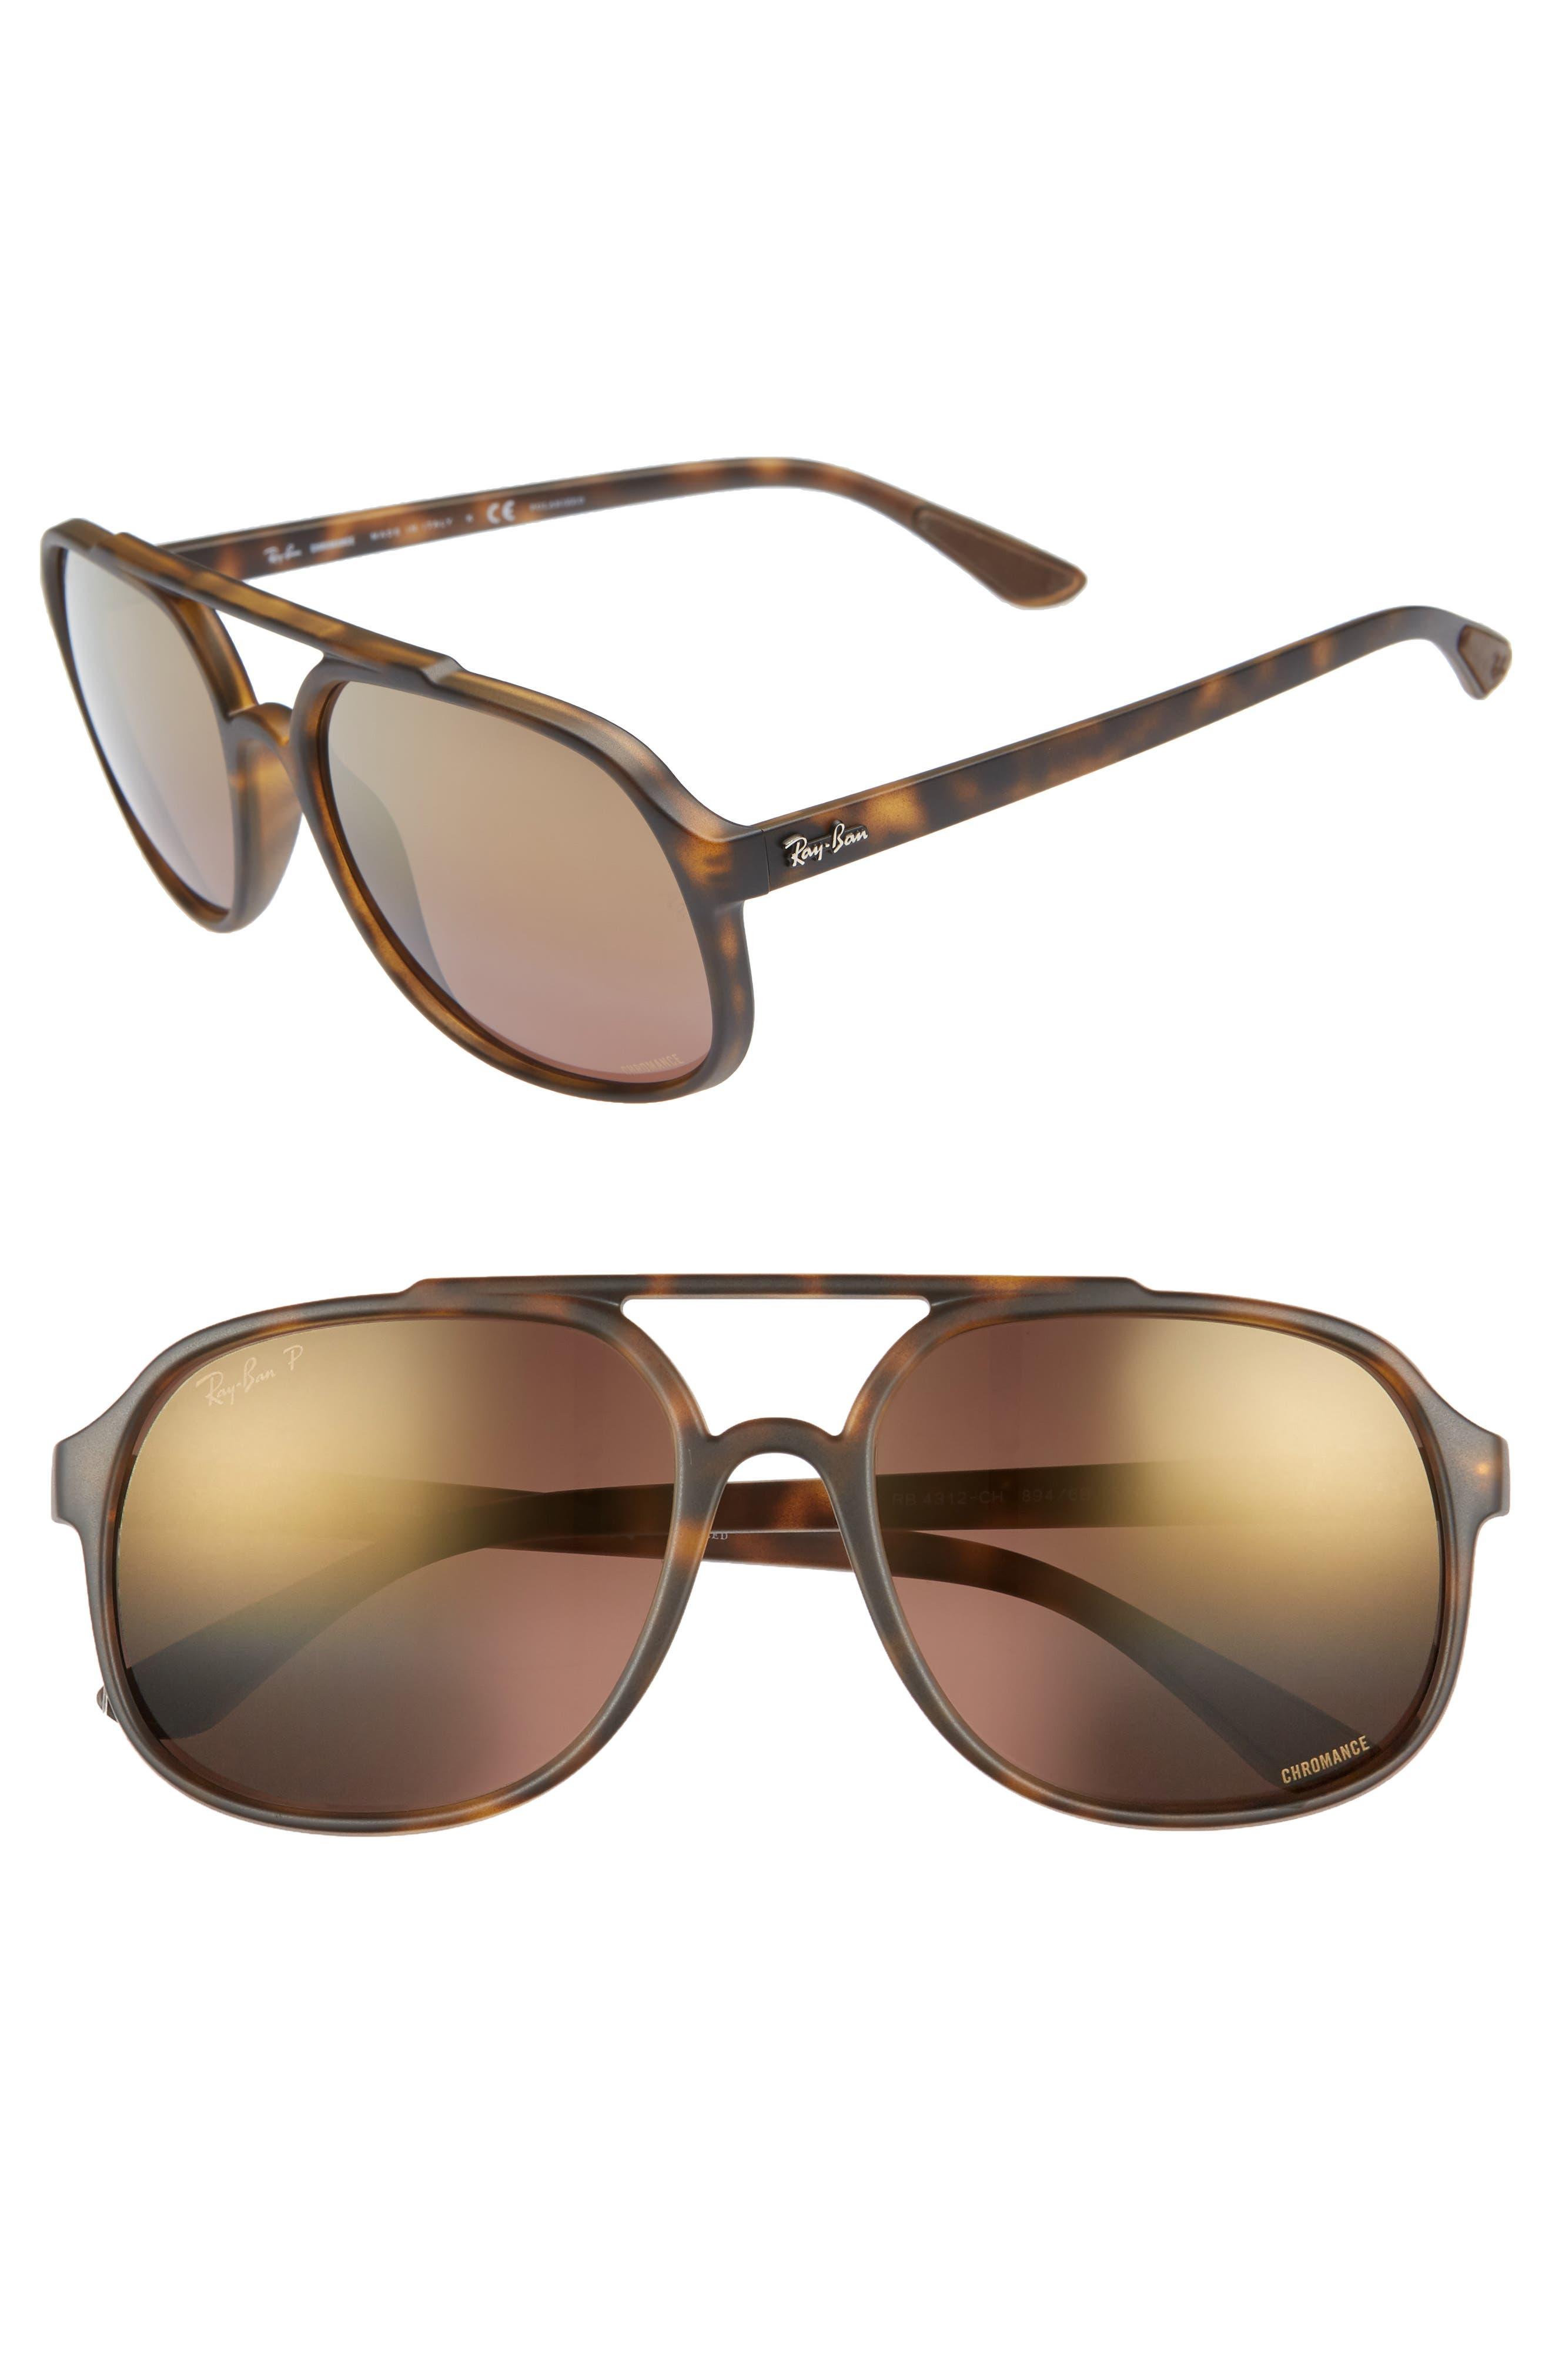 Ray-Ban 57Mm Polarized Navigator Sunglasses - Havana